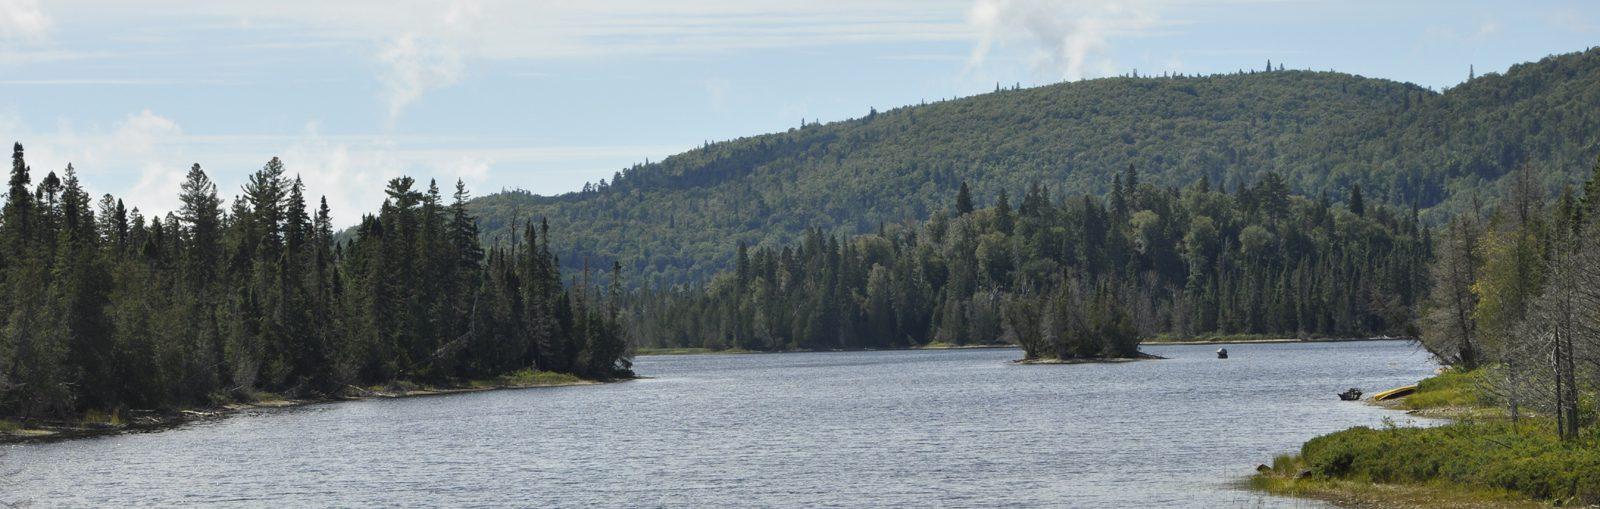 Northern ontario river